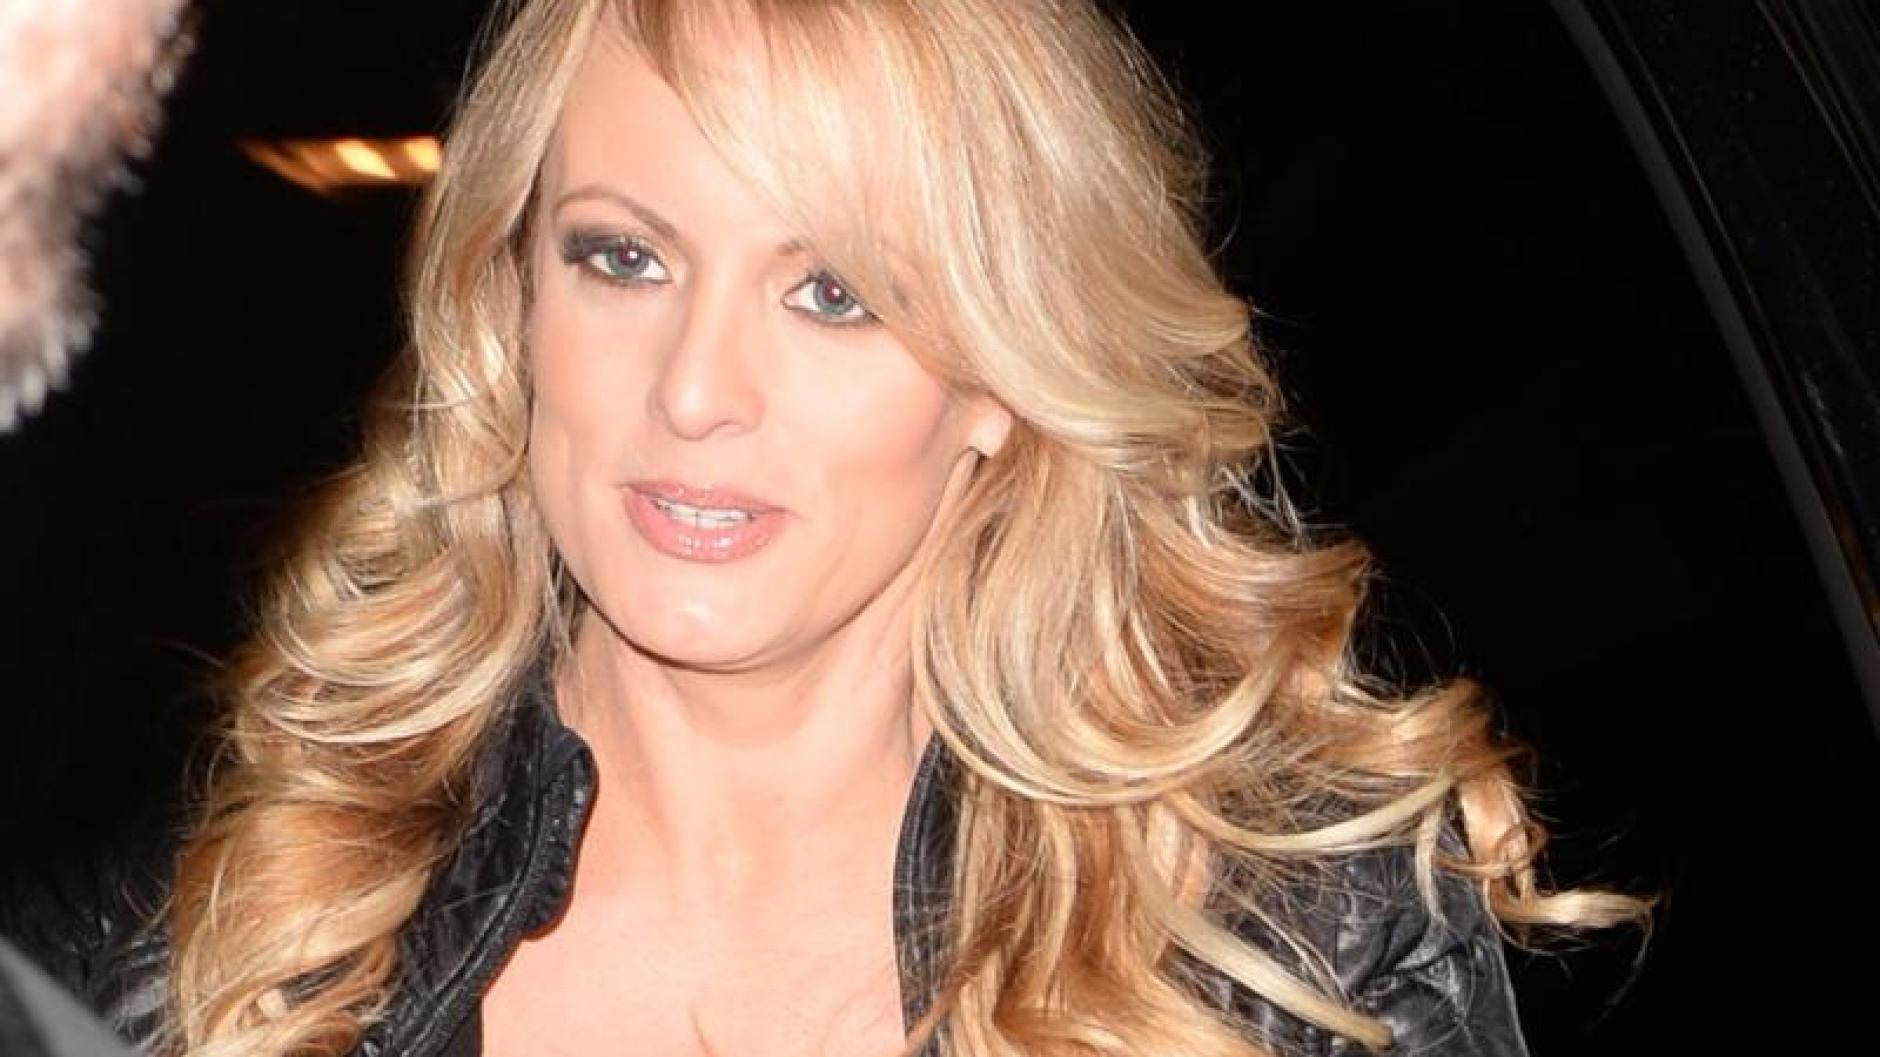 Lasziv: Stormy Daniels über ihre Playboy-Fotos